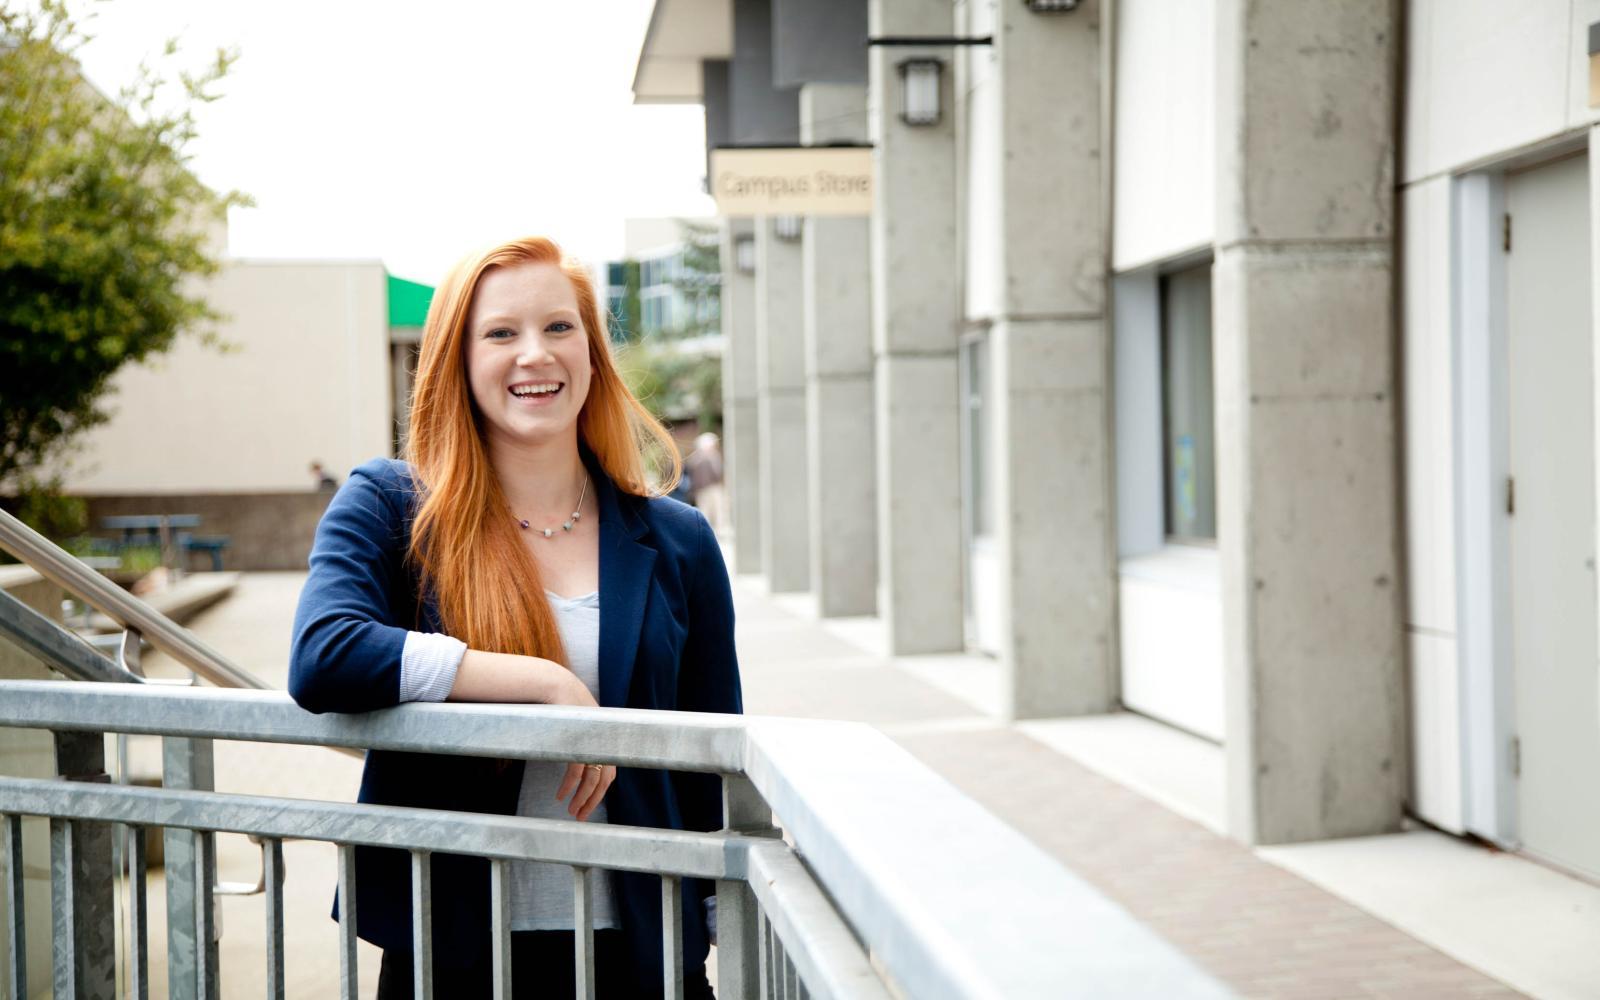 VIU Student, Hannah Donovan